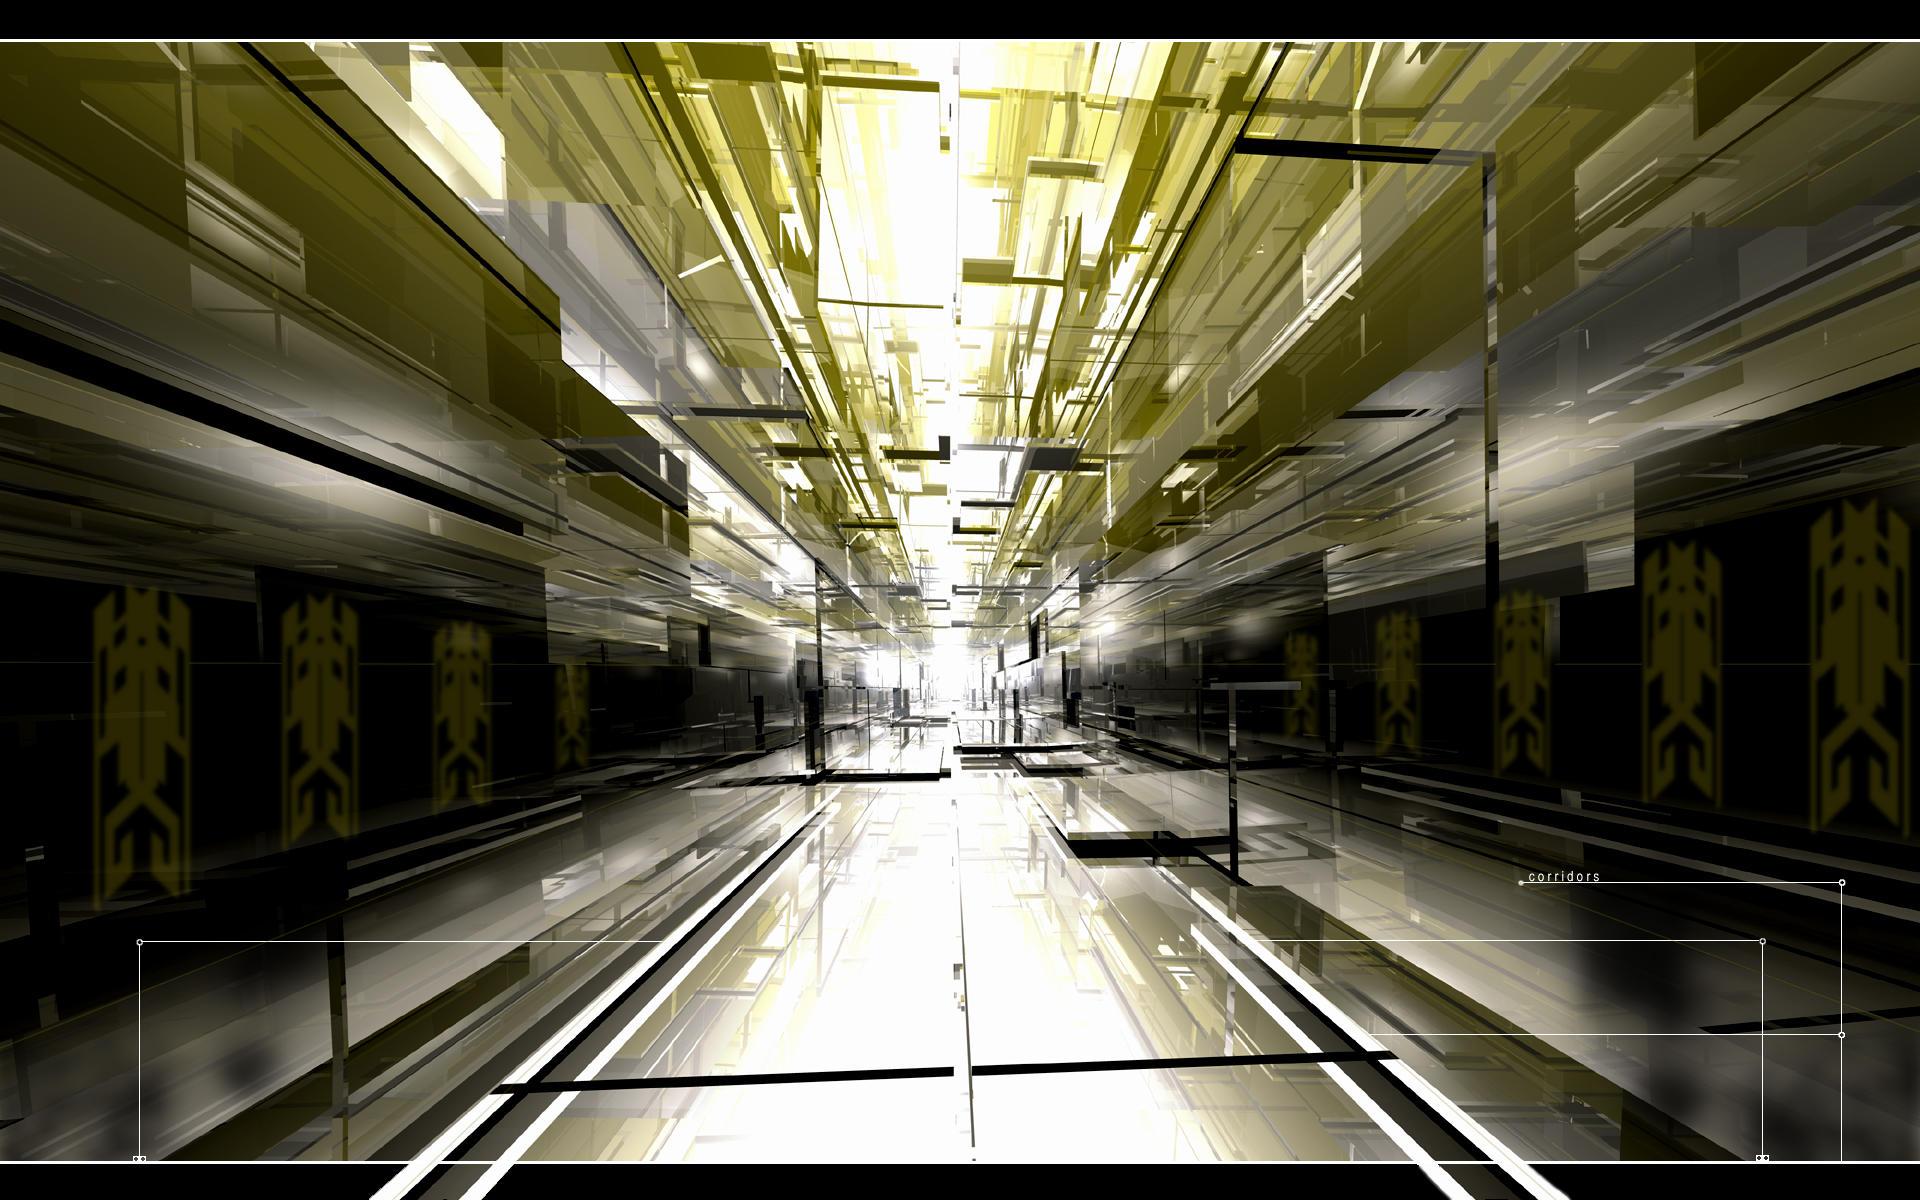 Corridors WS by aurora900